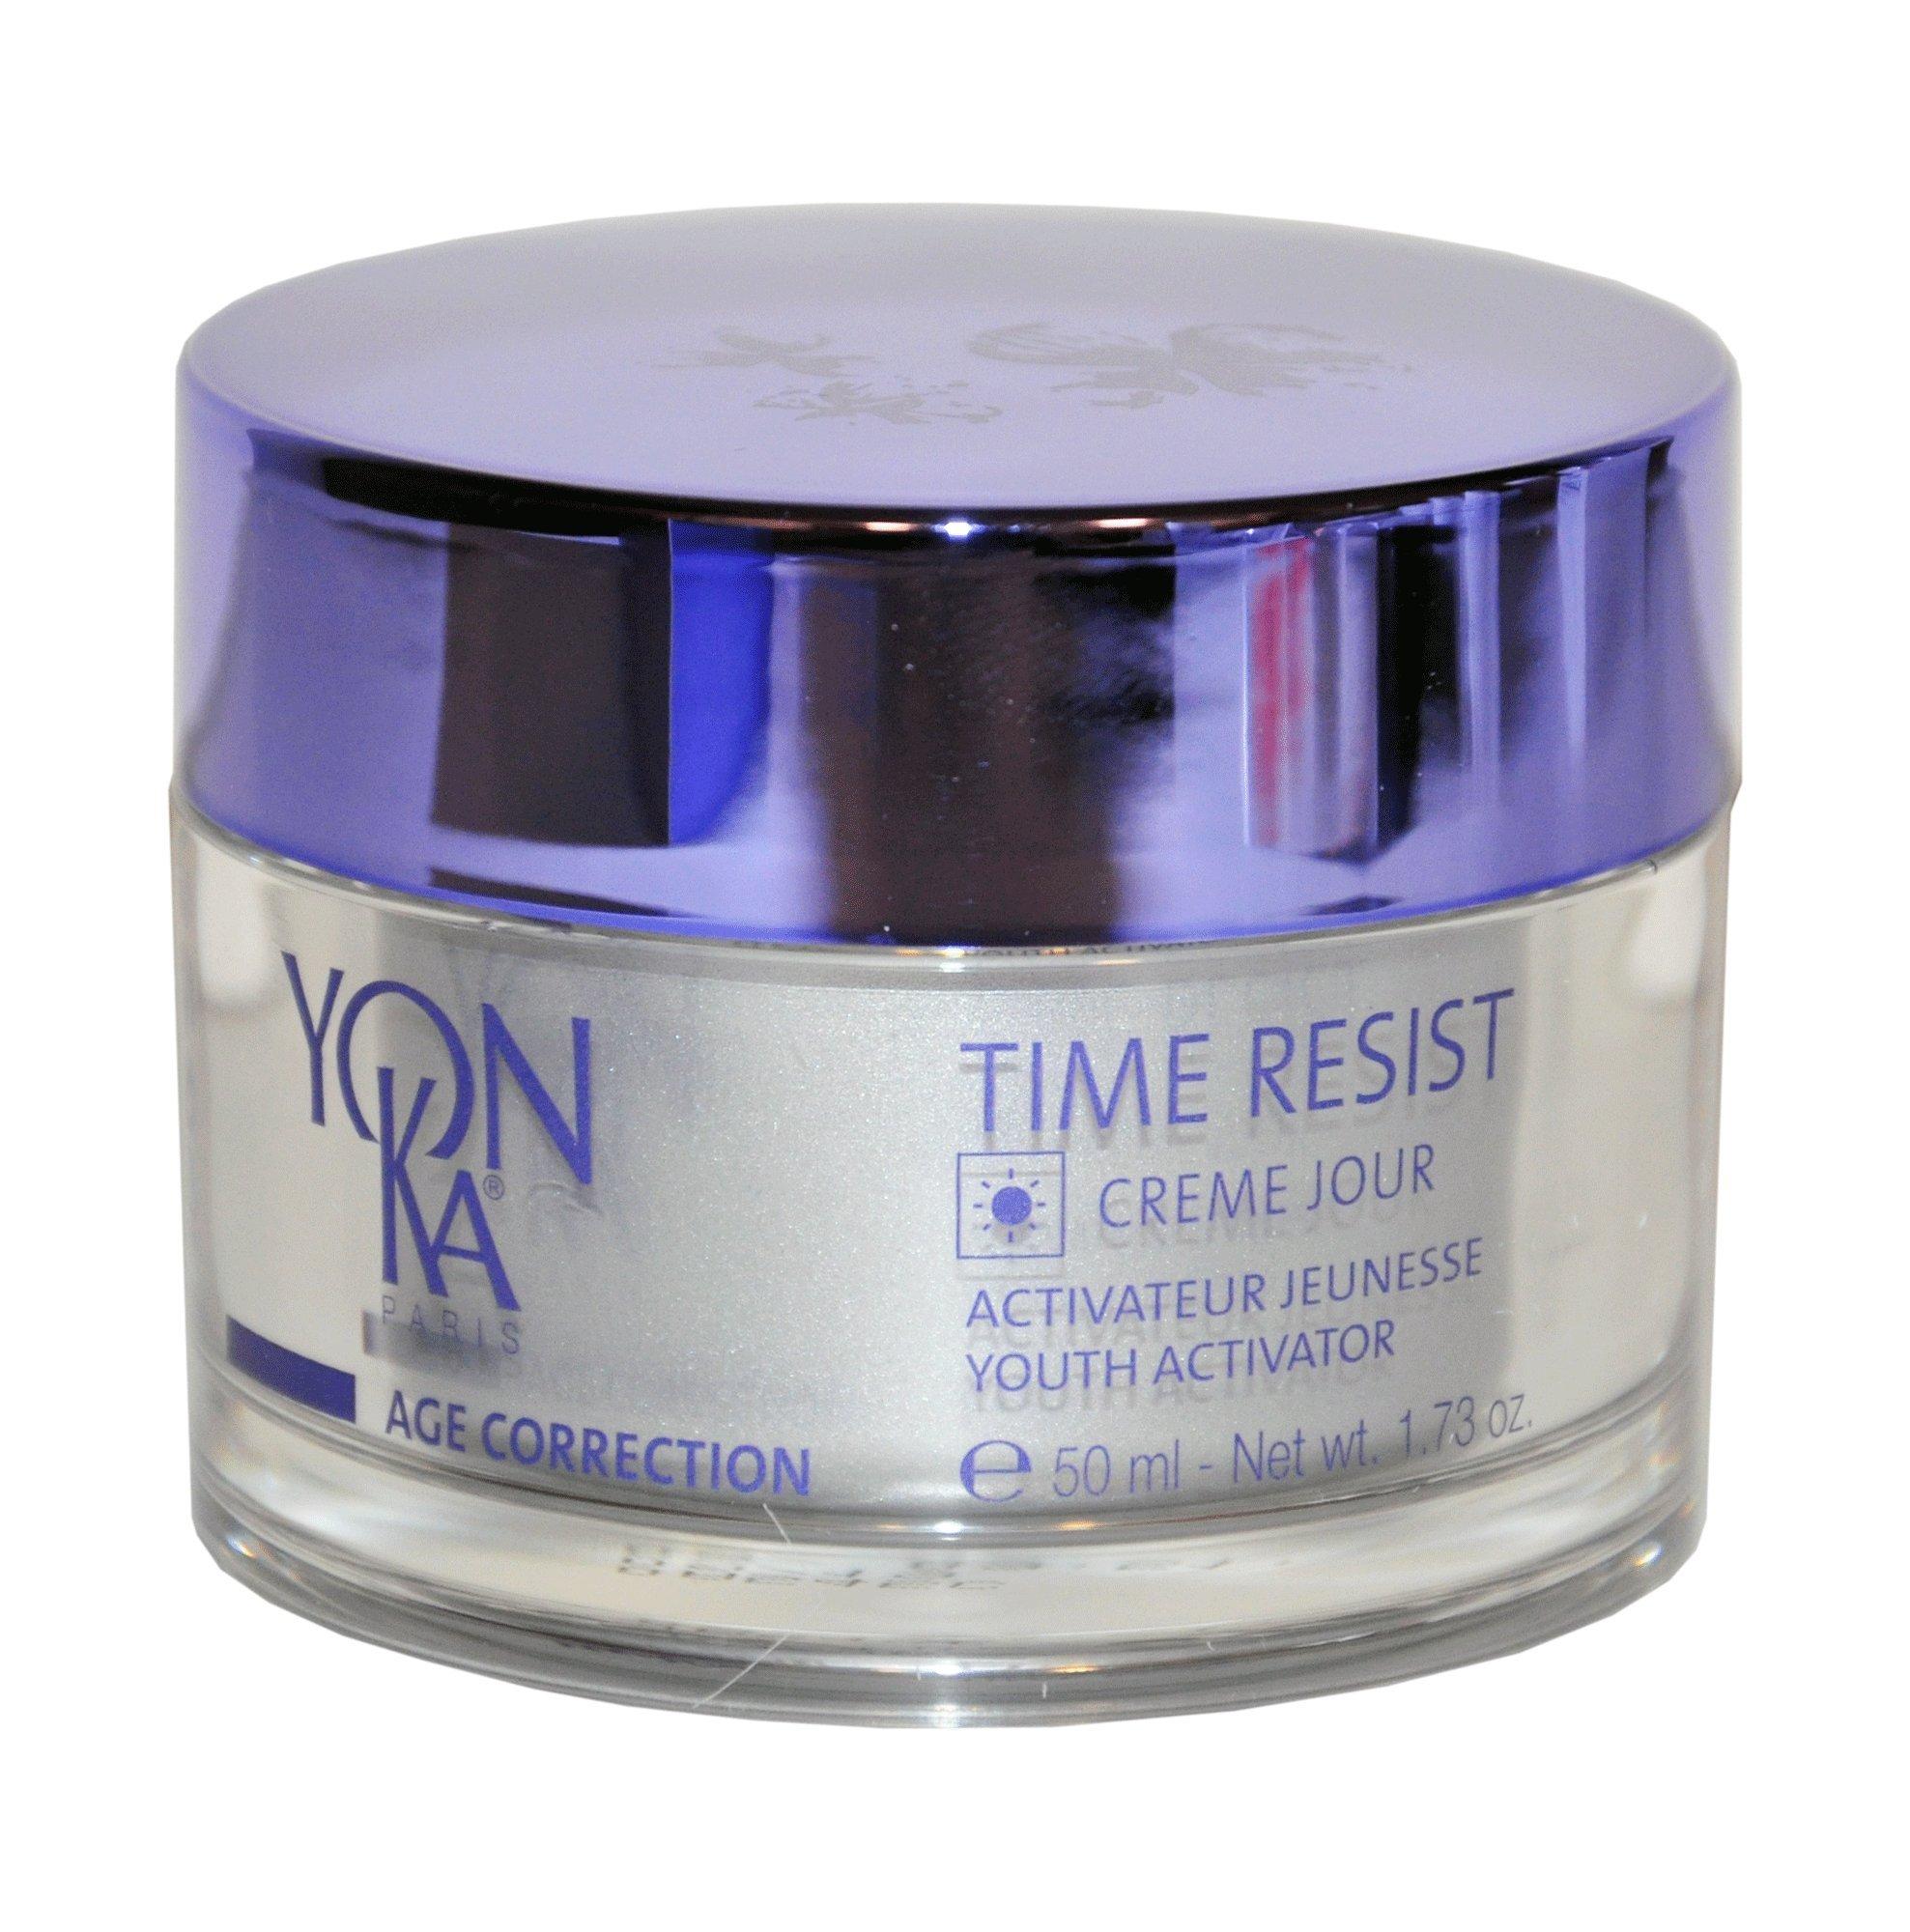 YONKA TIME RESIST CREME CREAM JOUR 1.75 oz. - BRAND NEW